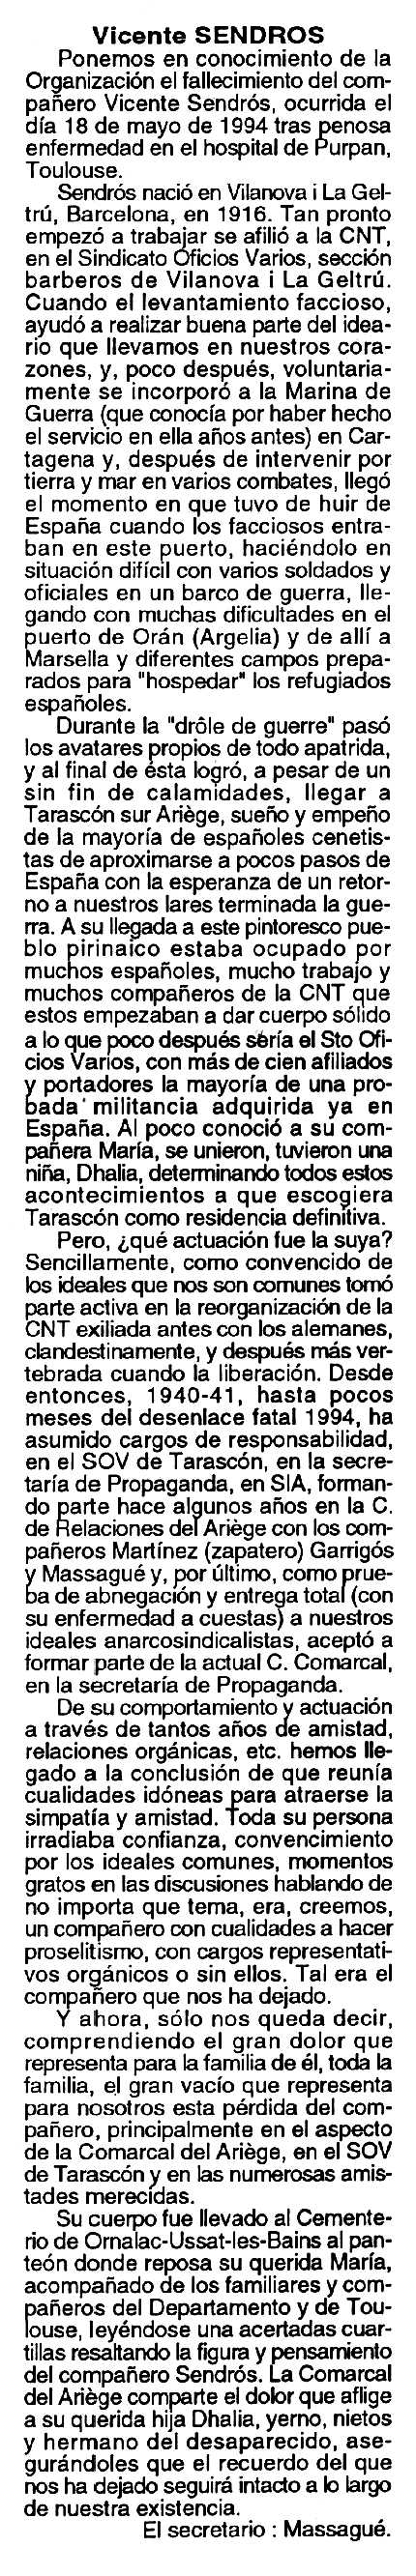 "Necrològica de Vicenç Sendrós Nolla apareguda en el periòdic tolosà ""Cenit"" del 21 de juny de 1994"